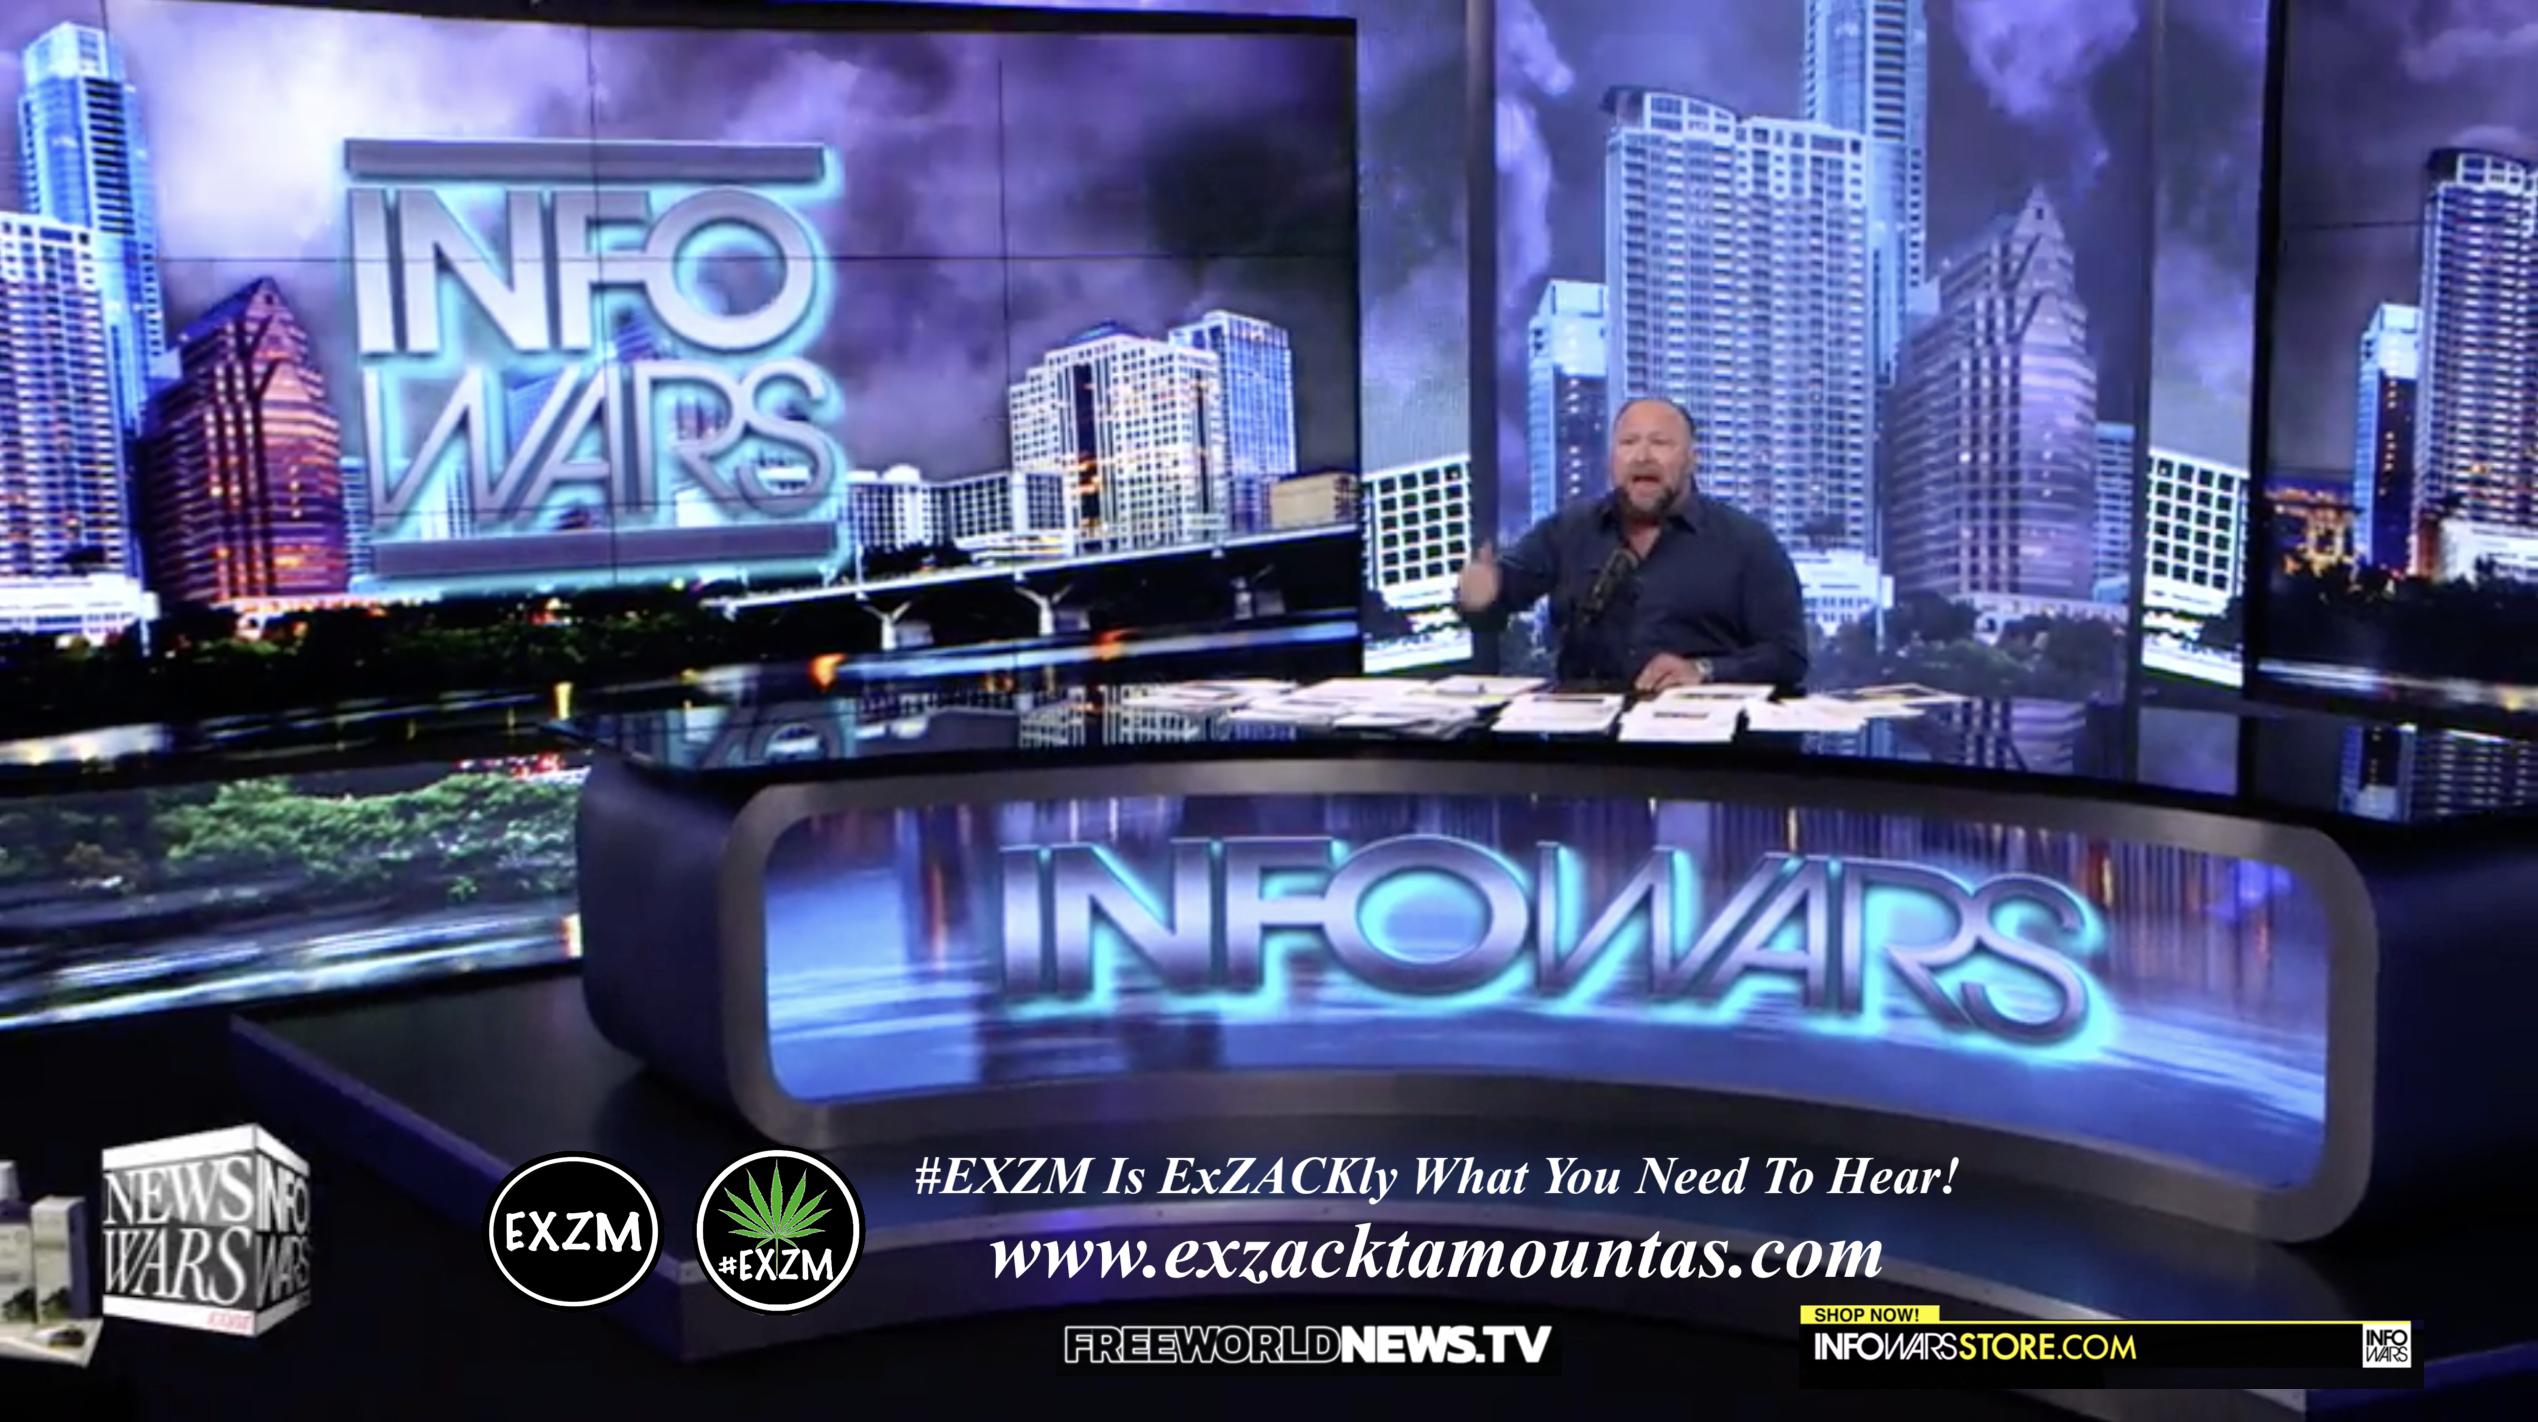 Alex Jones Live In Infowars Studio Free World News TV EXZM Zack Mount August 24th 2021 copy